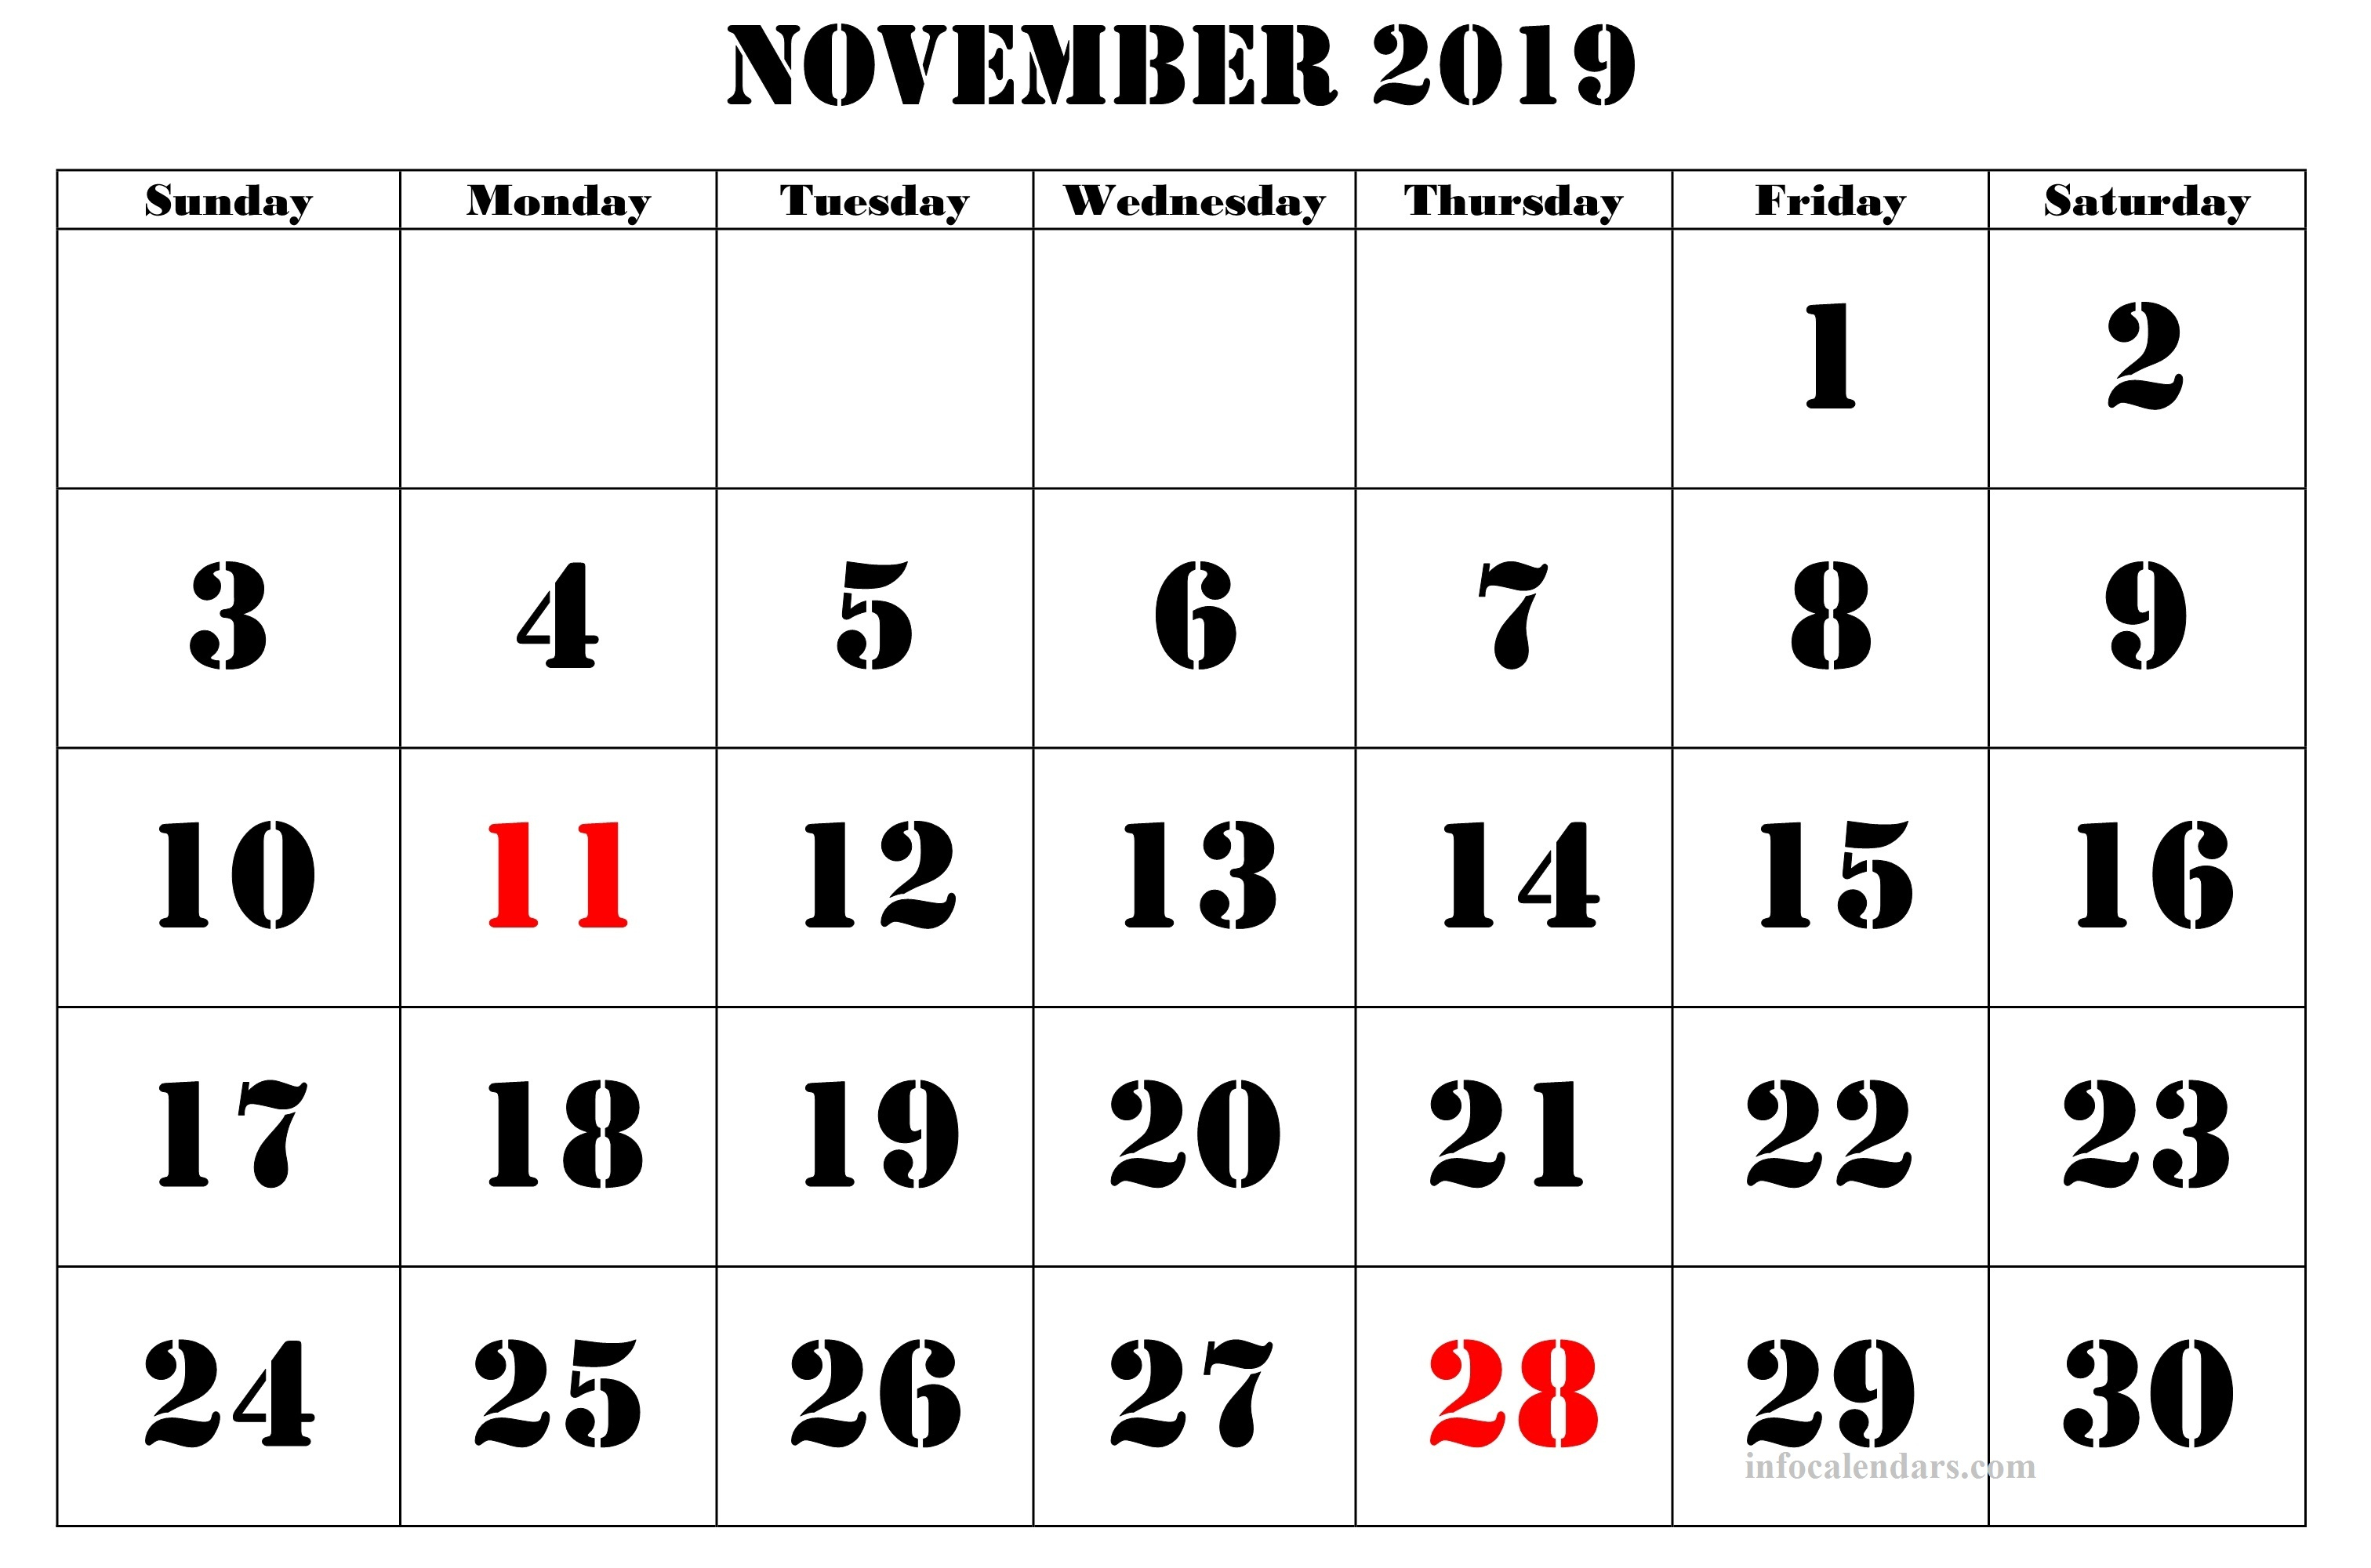 November 2019 Printable Calendar With Time Slots